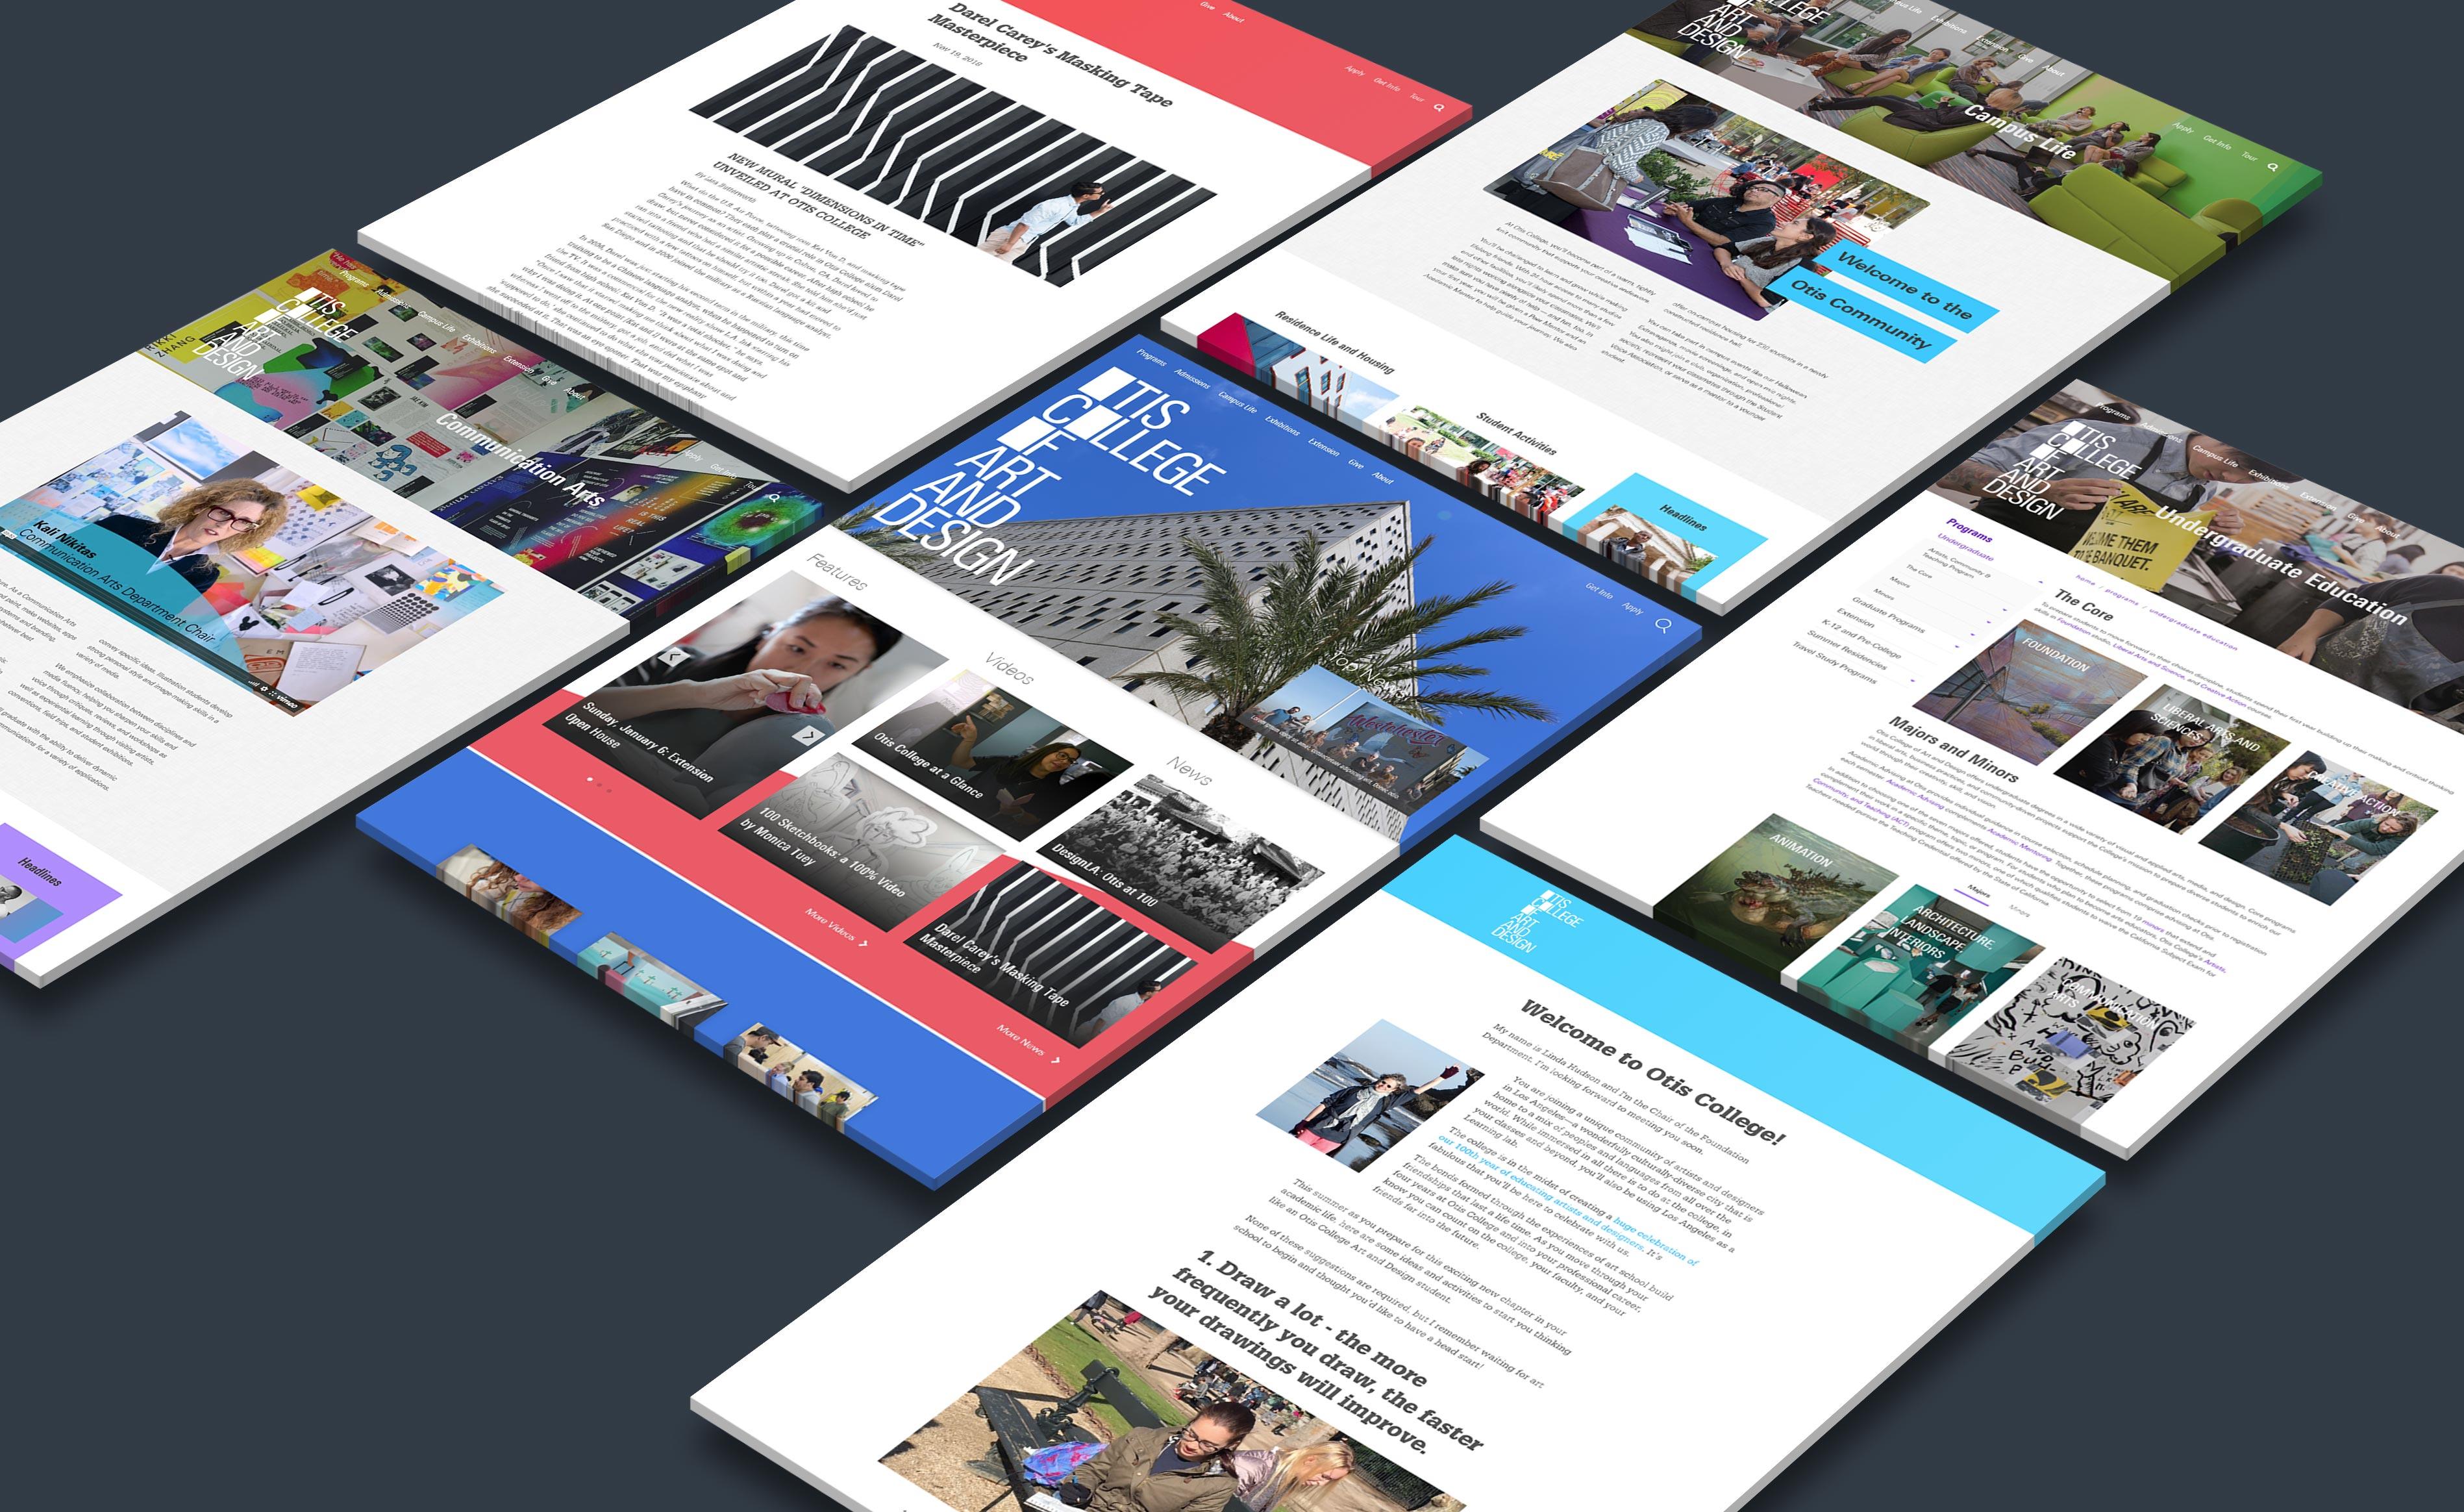 Otis College of Art and Design - Website Flat Display